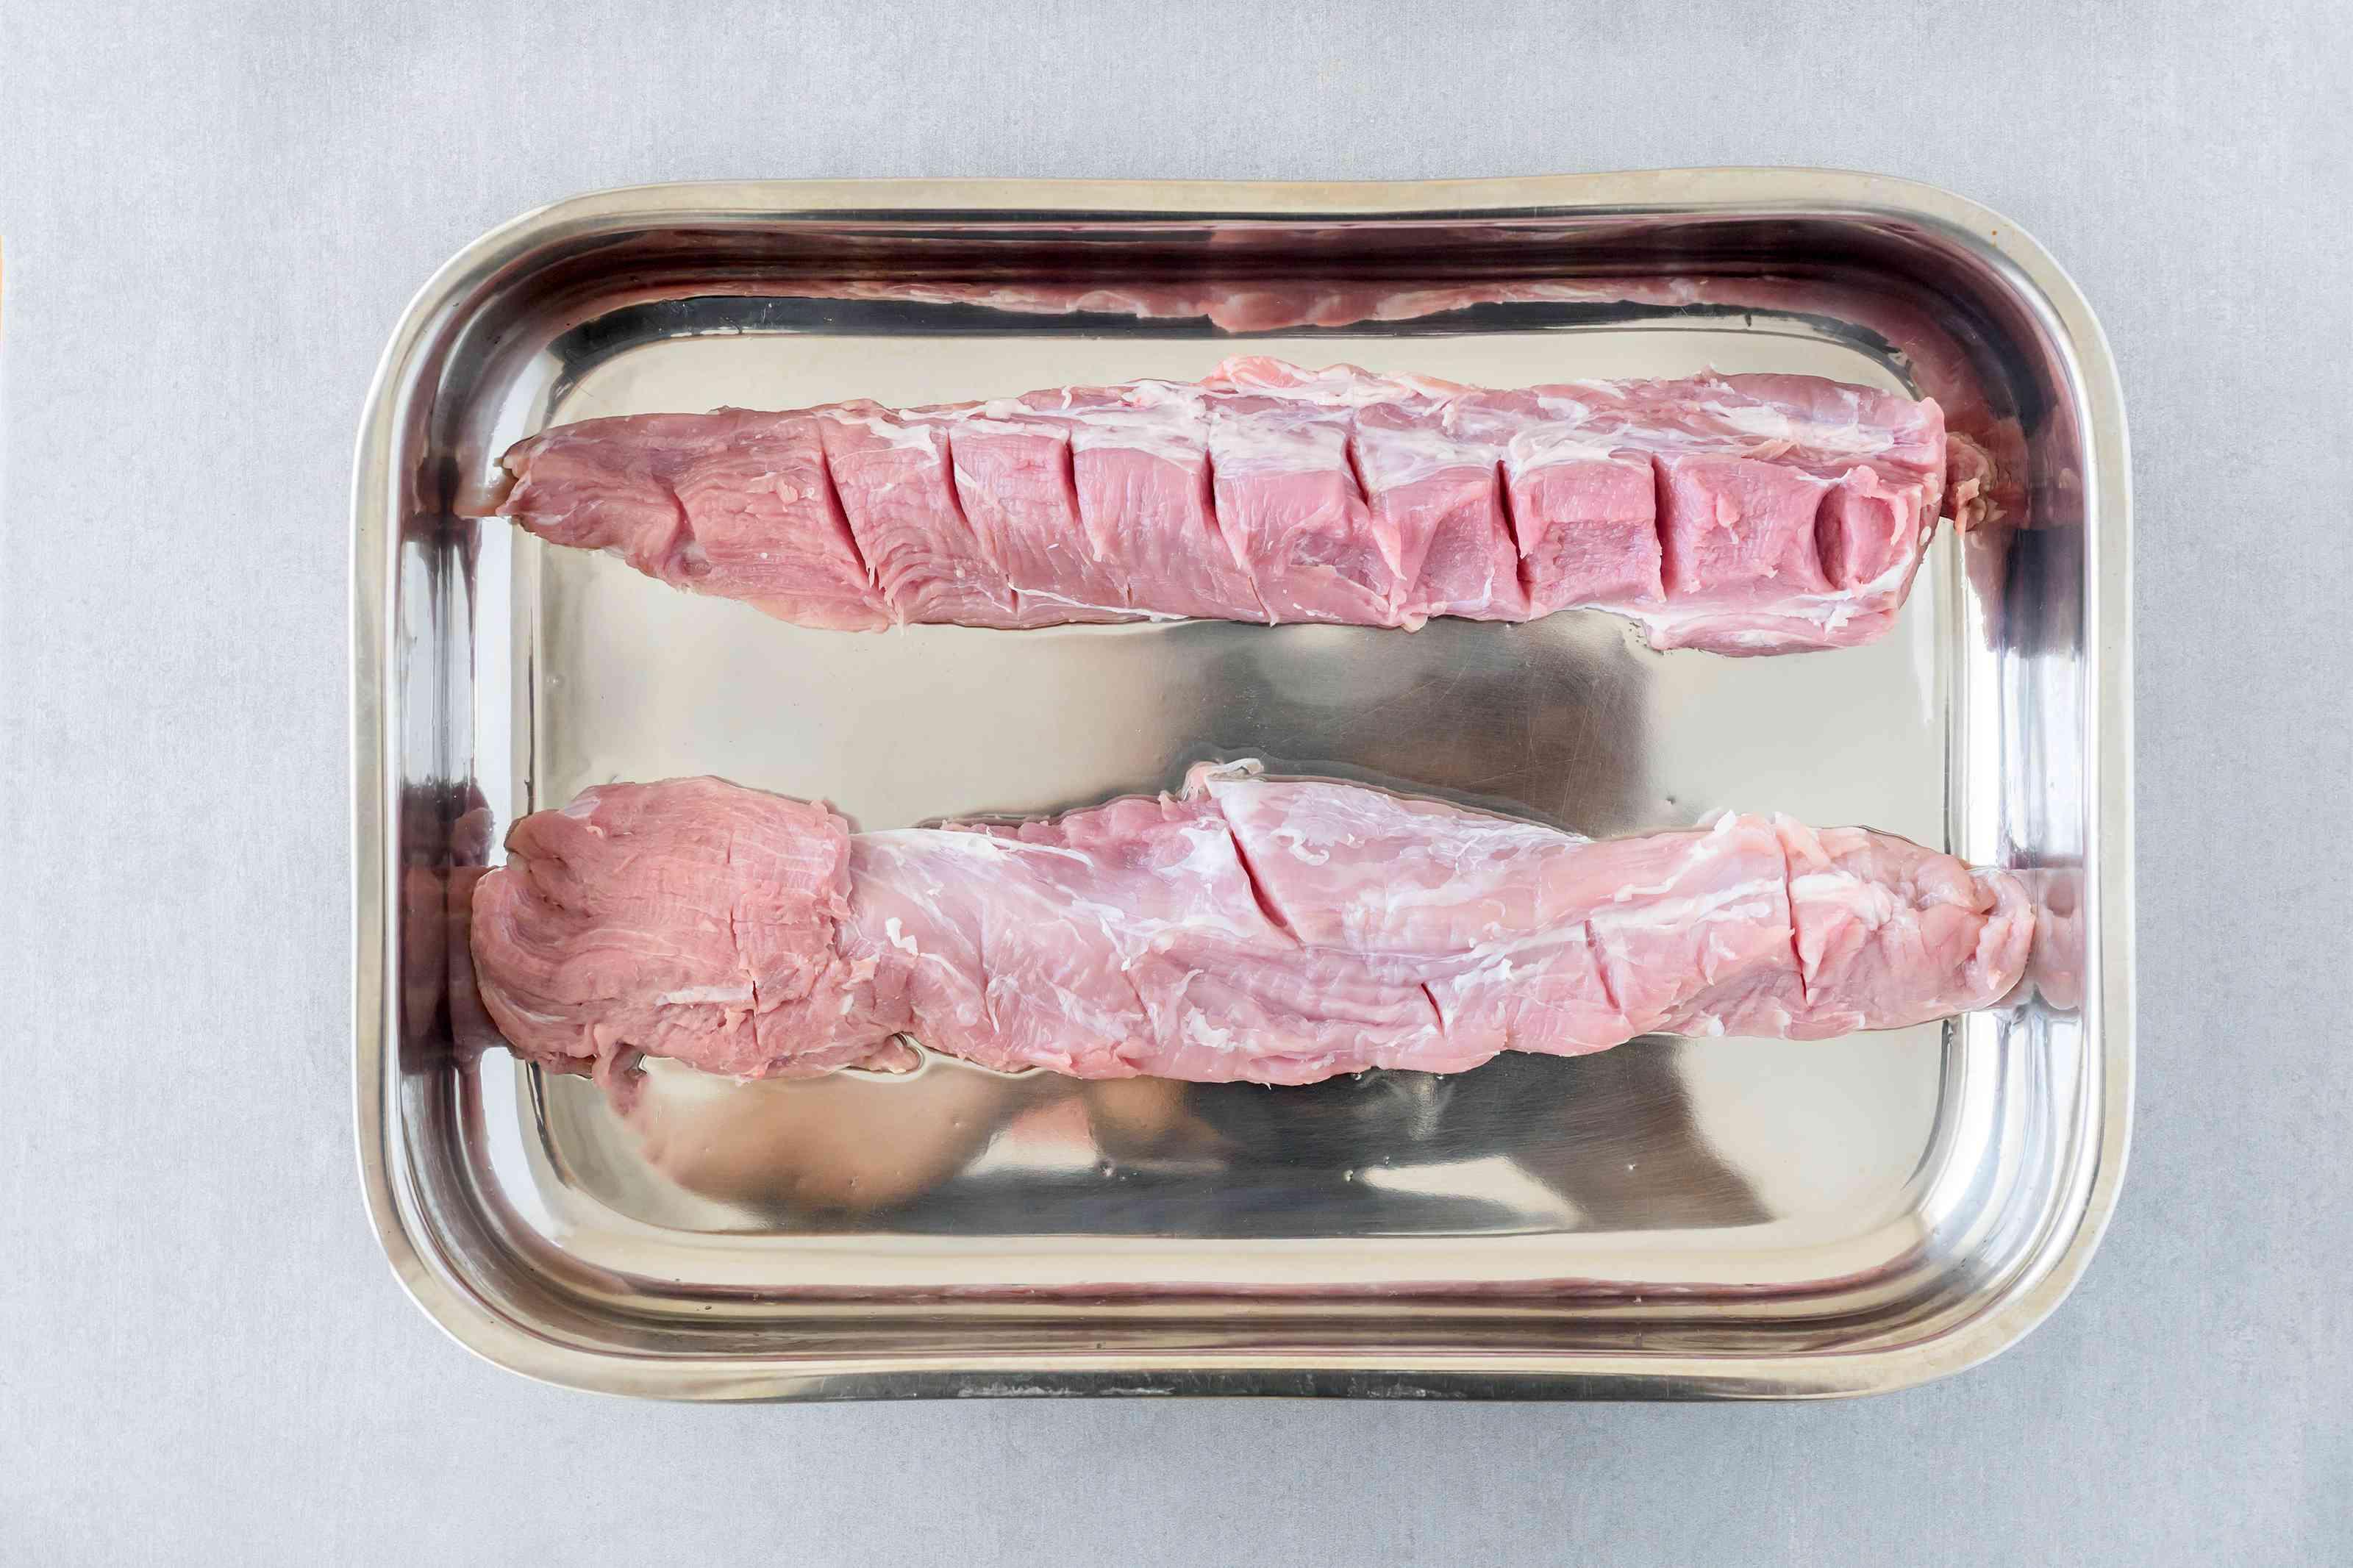 Place pork tenderloin in pan